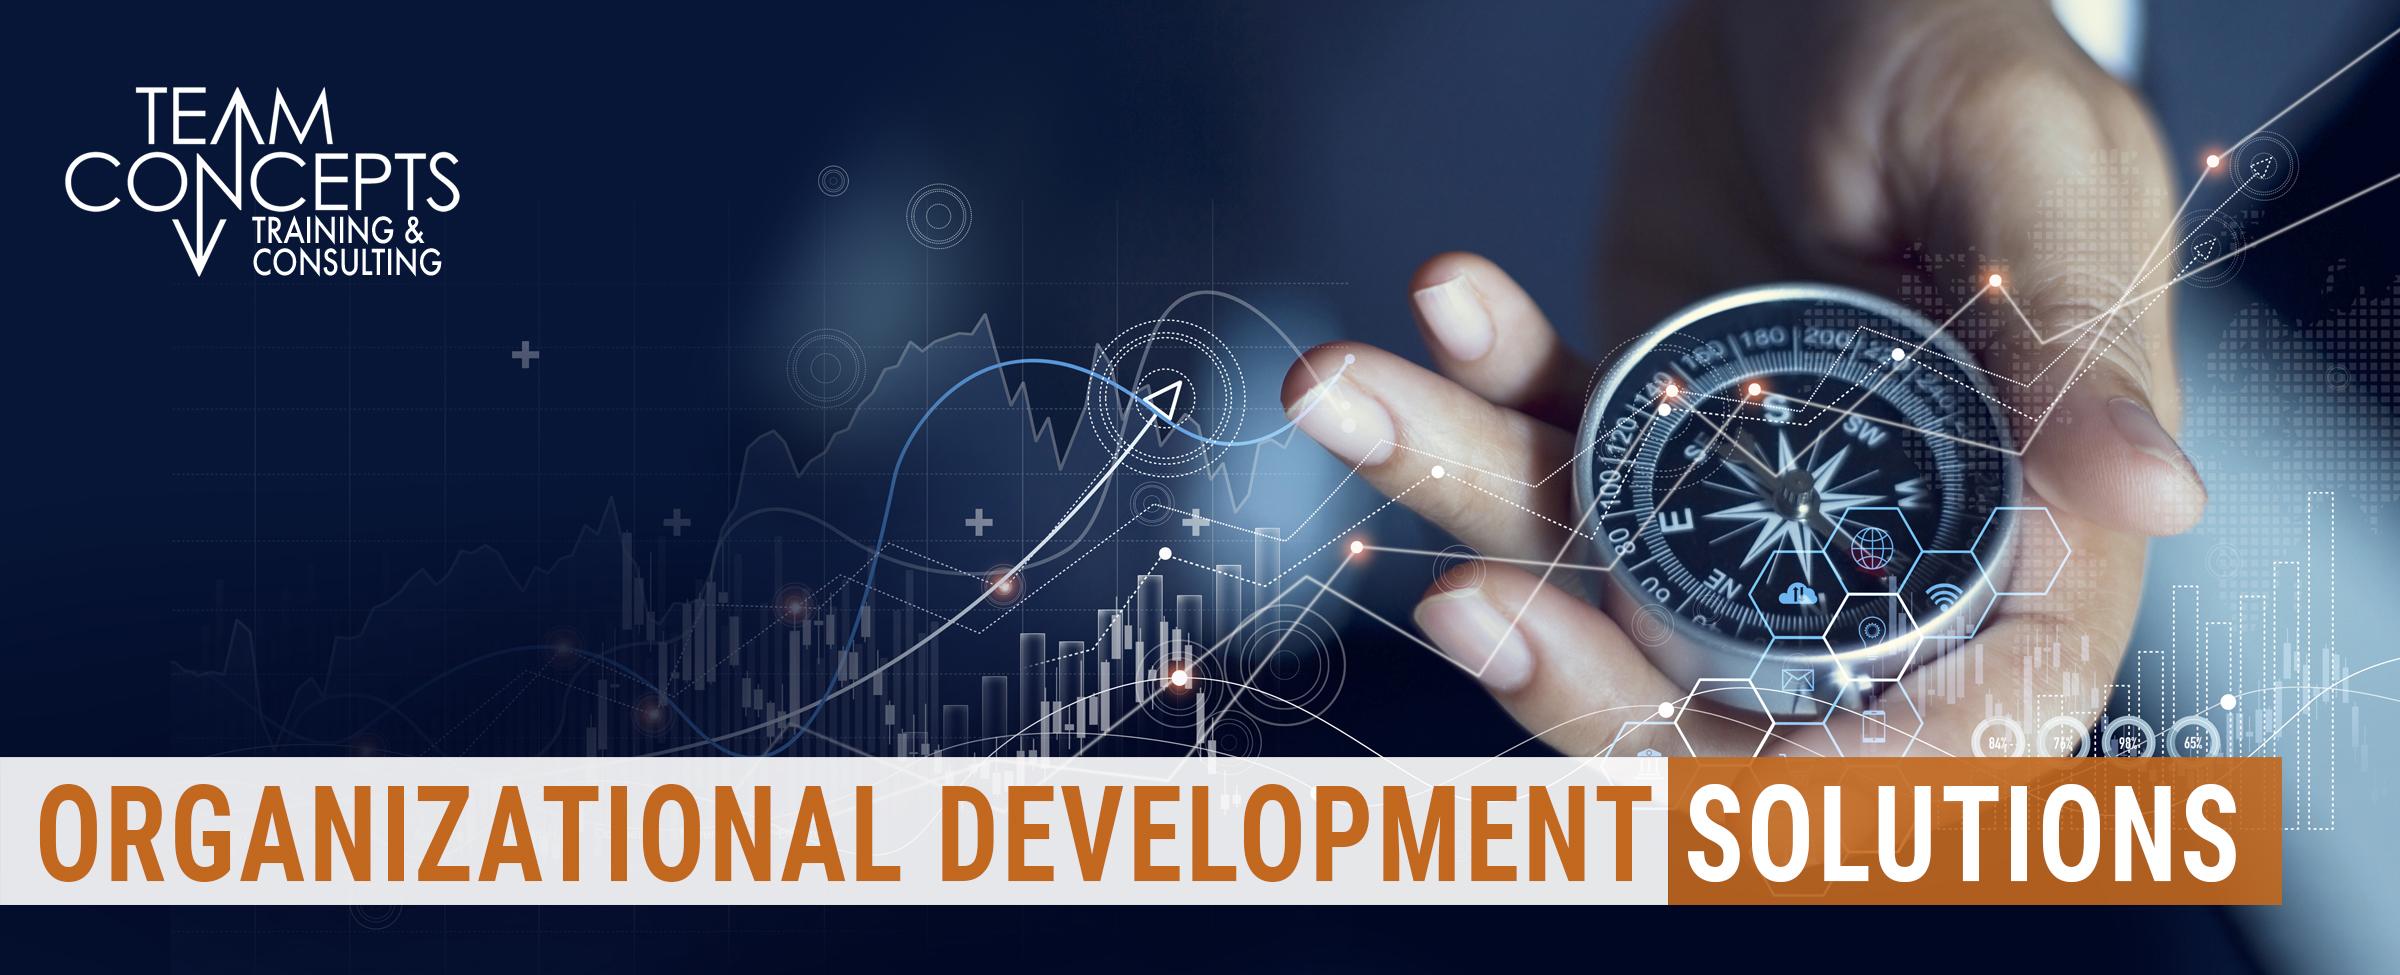 Organizational Development Solutions